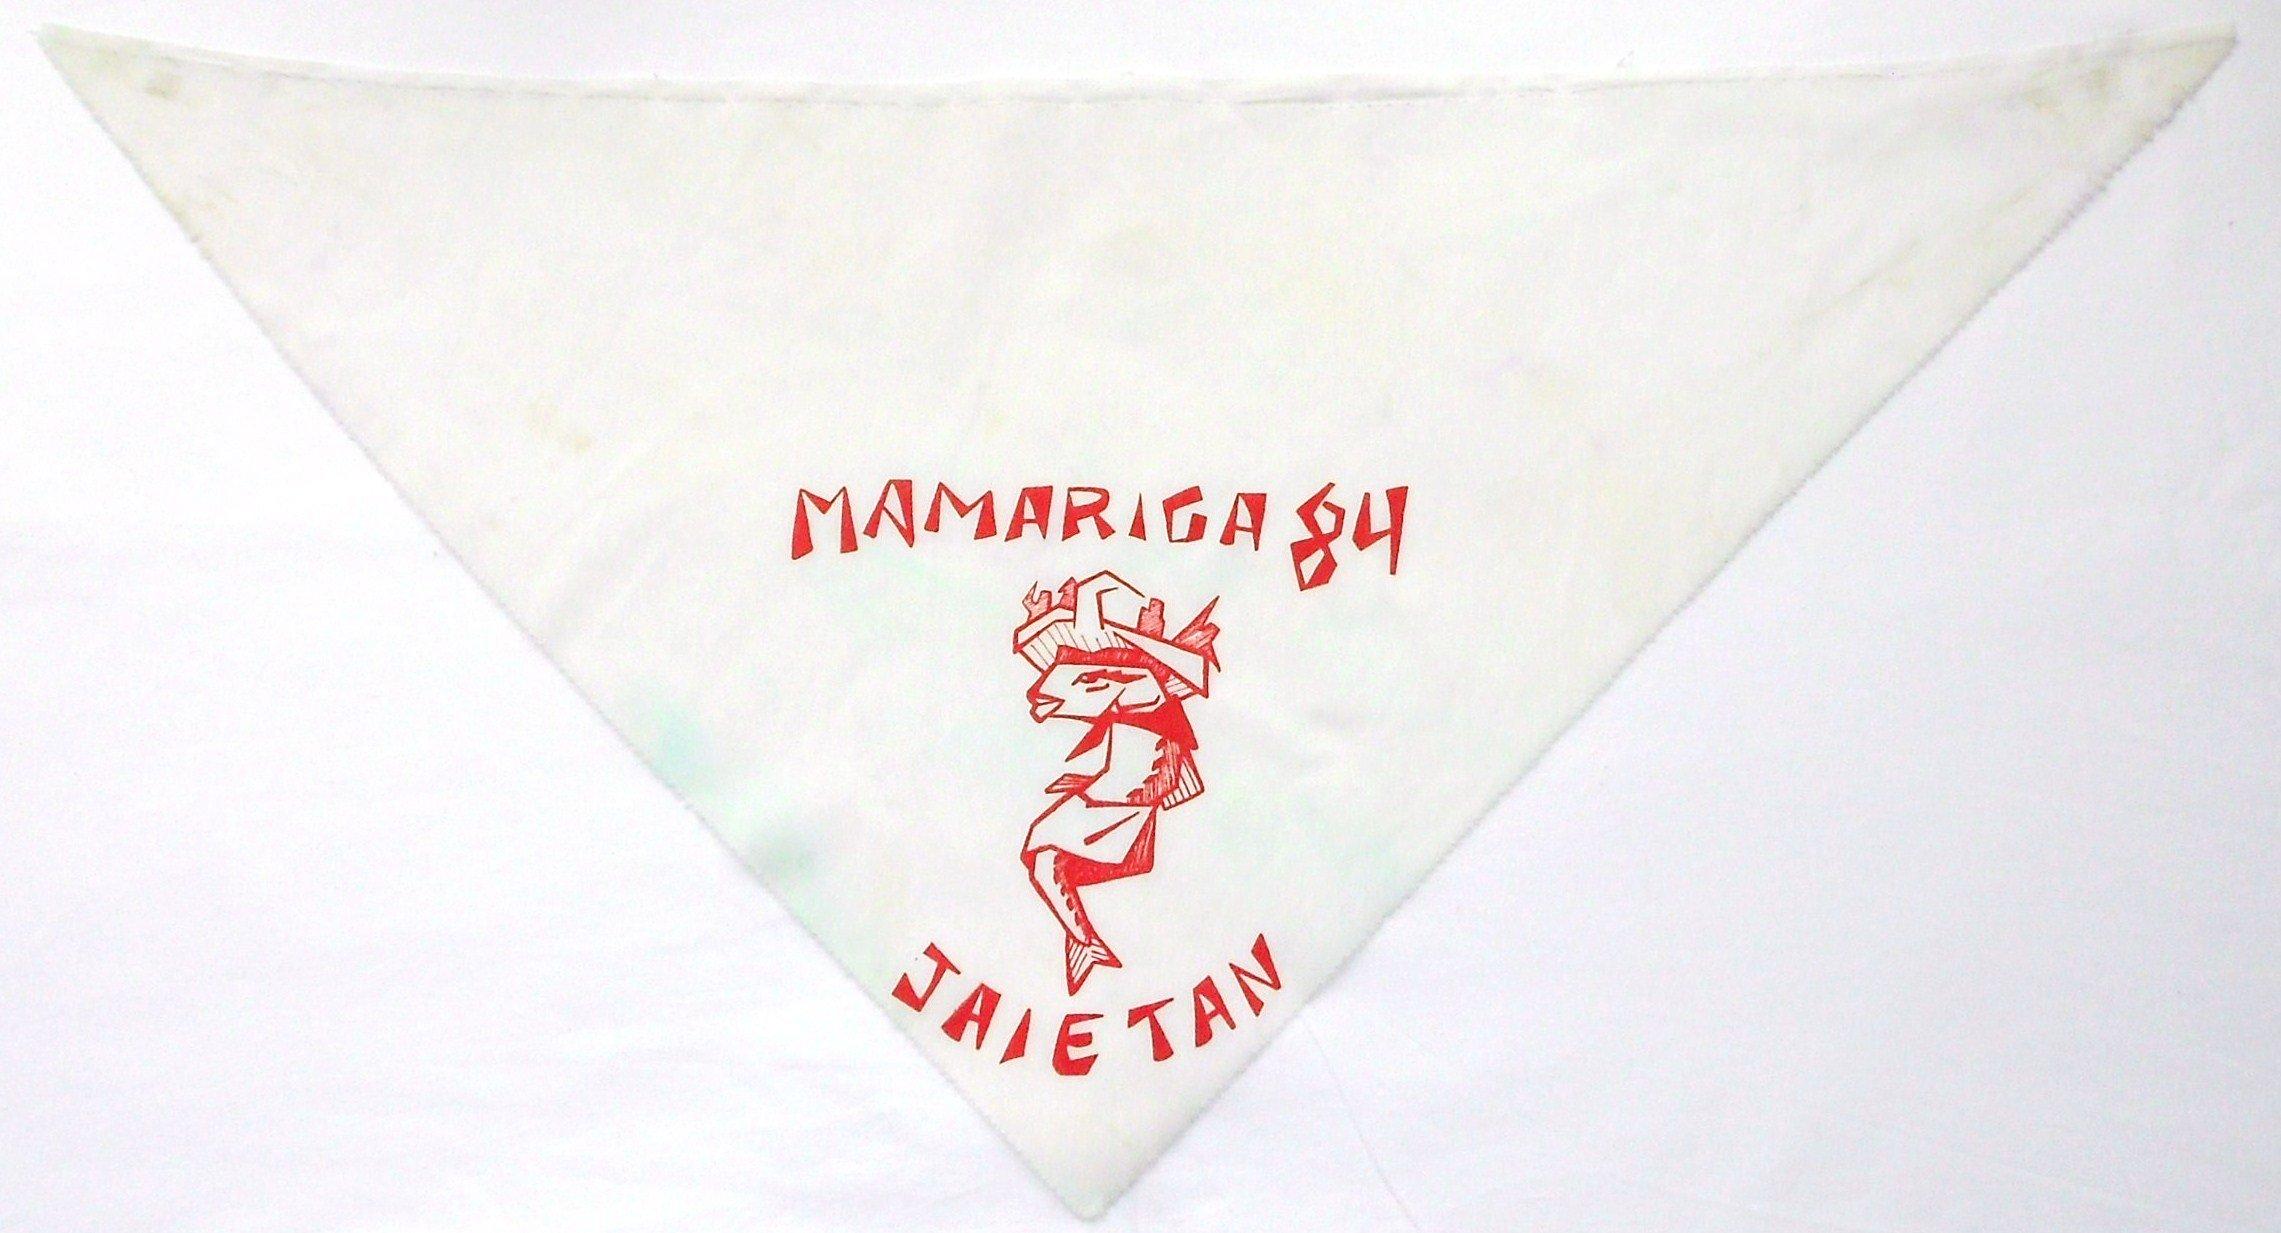 Pañuelo 1984